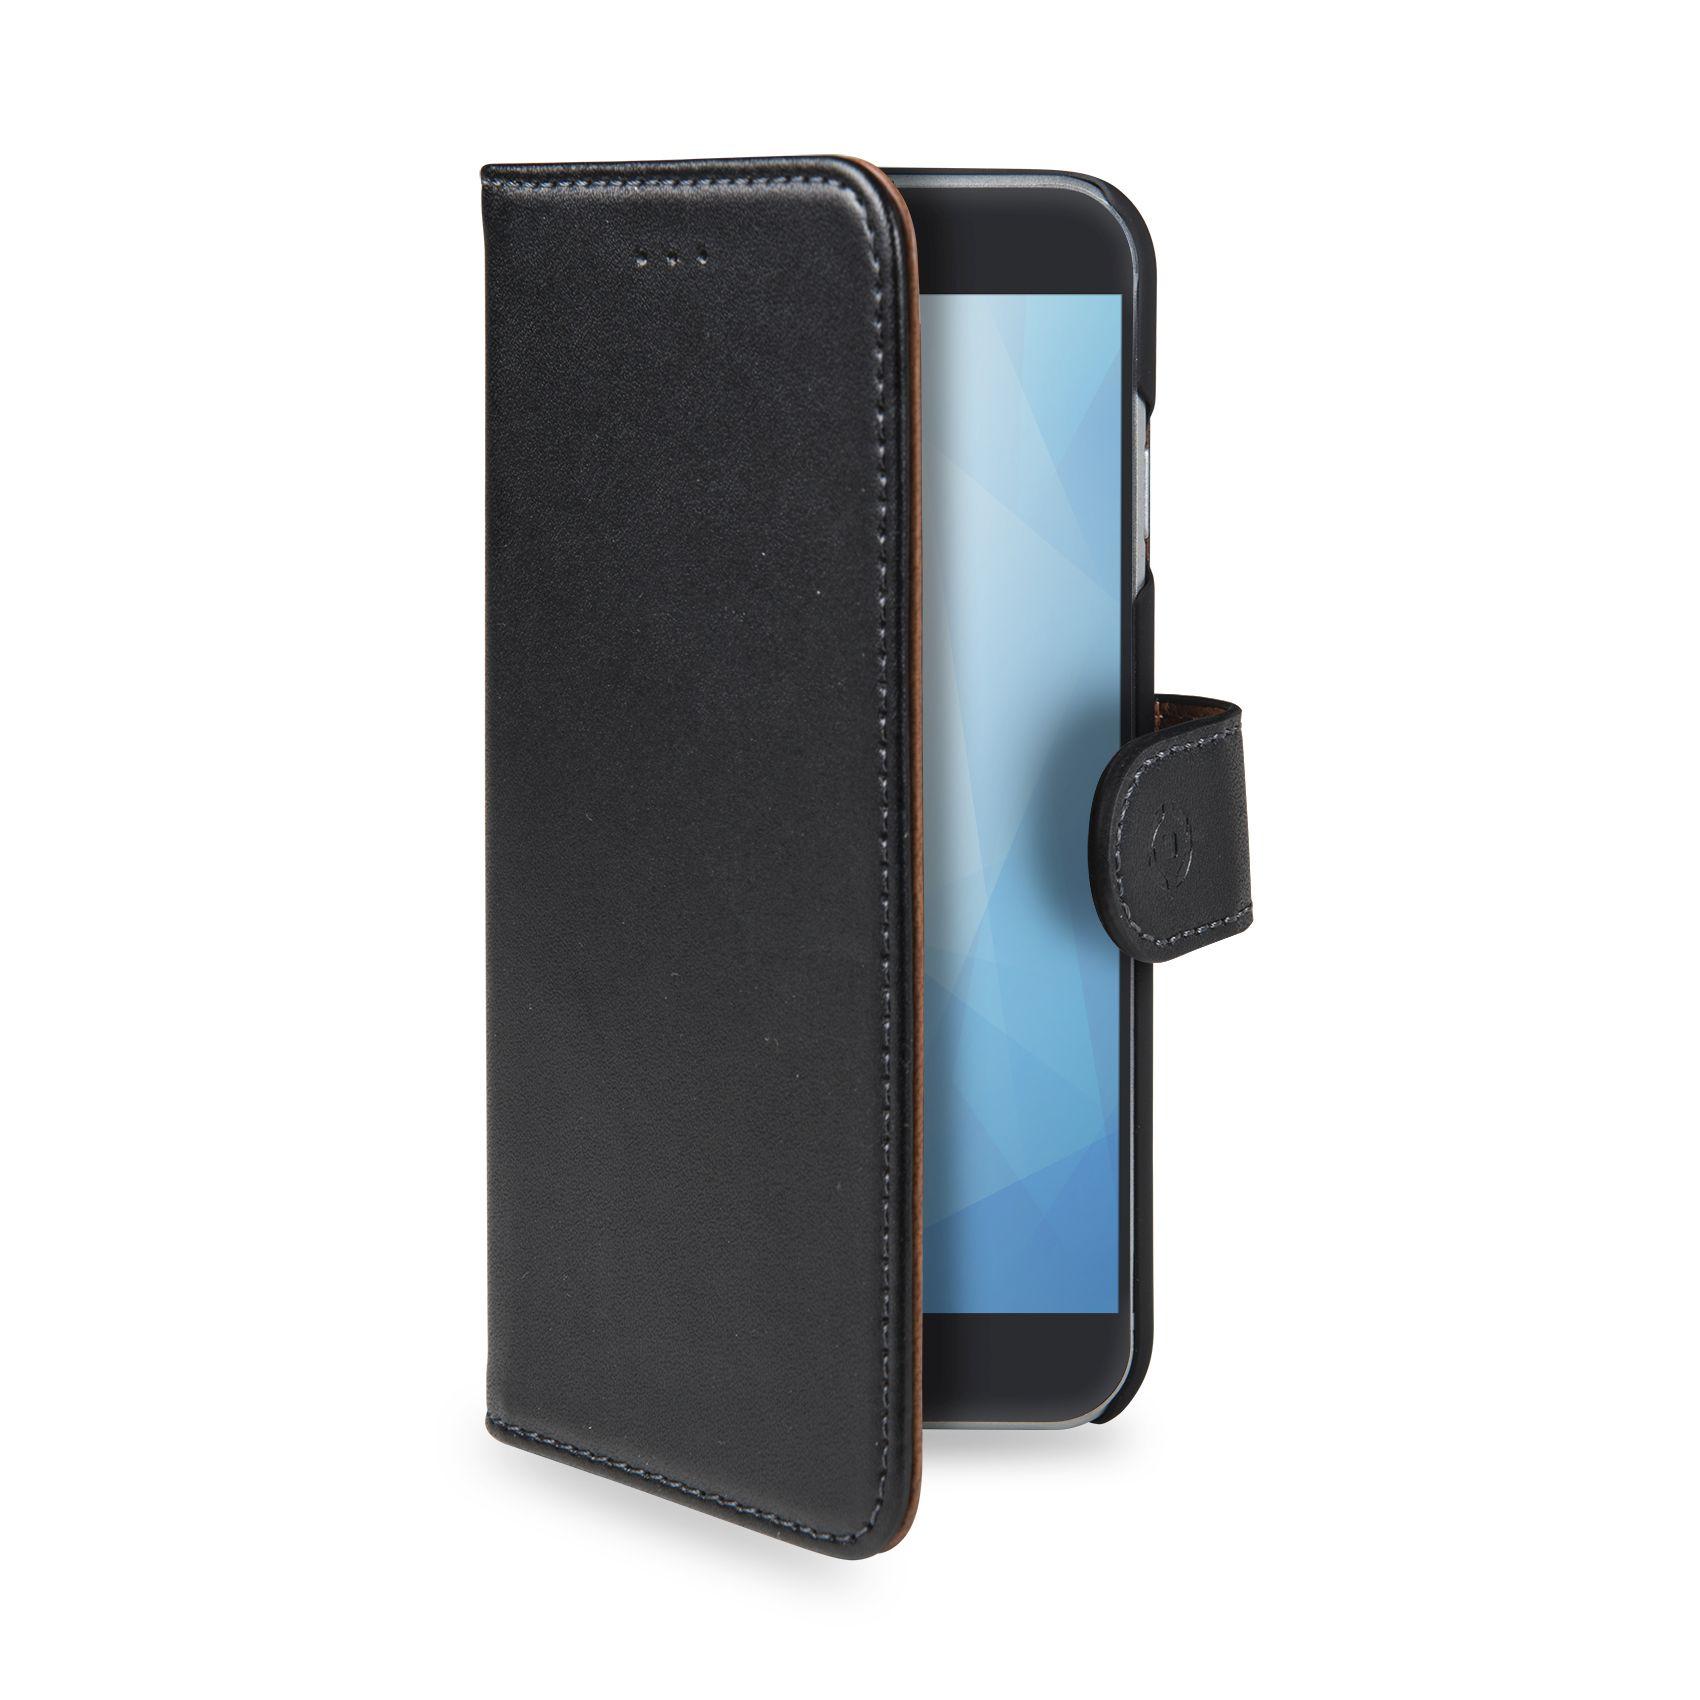 Pouzdro CELLY Wally pro Sony Xperia XZ2 Premium, PU kůže, black